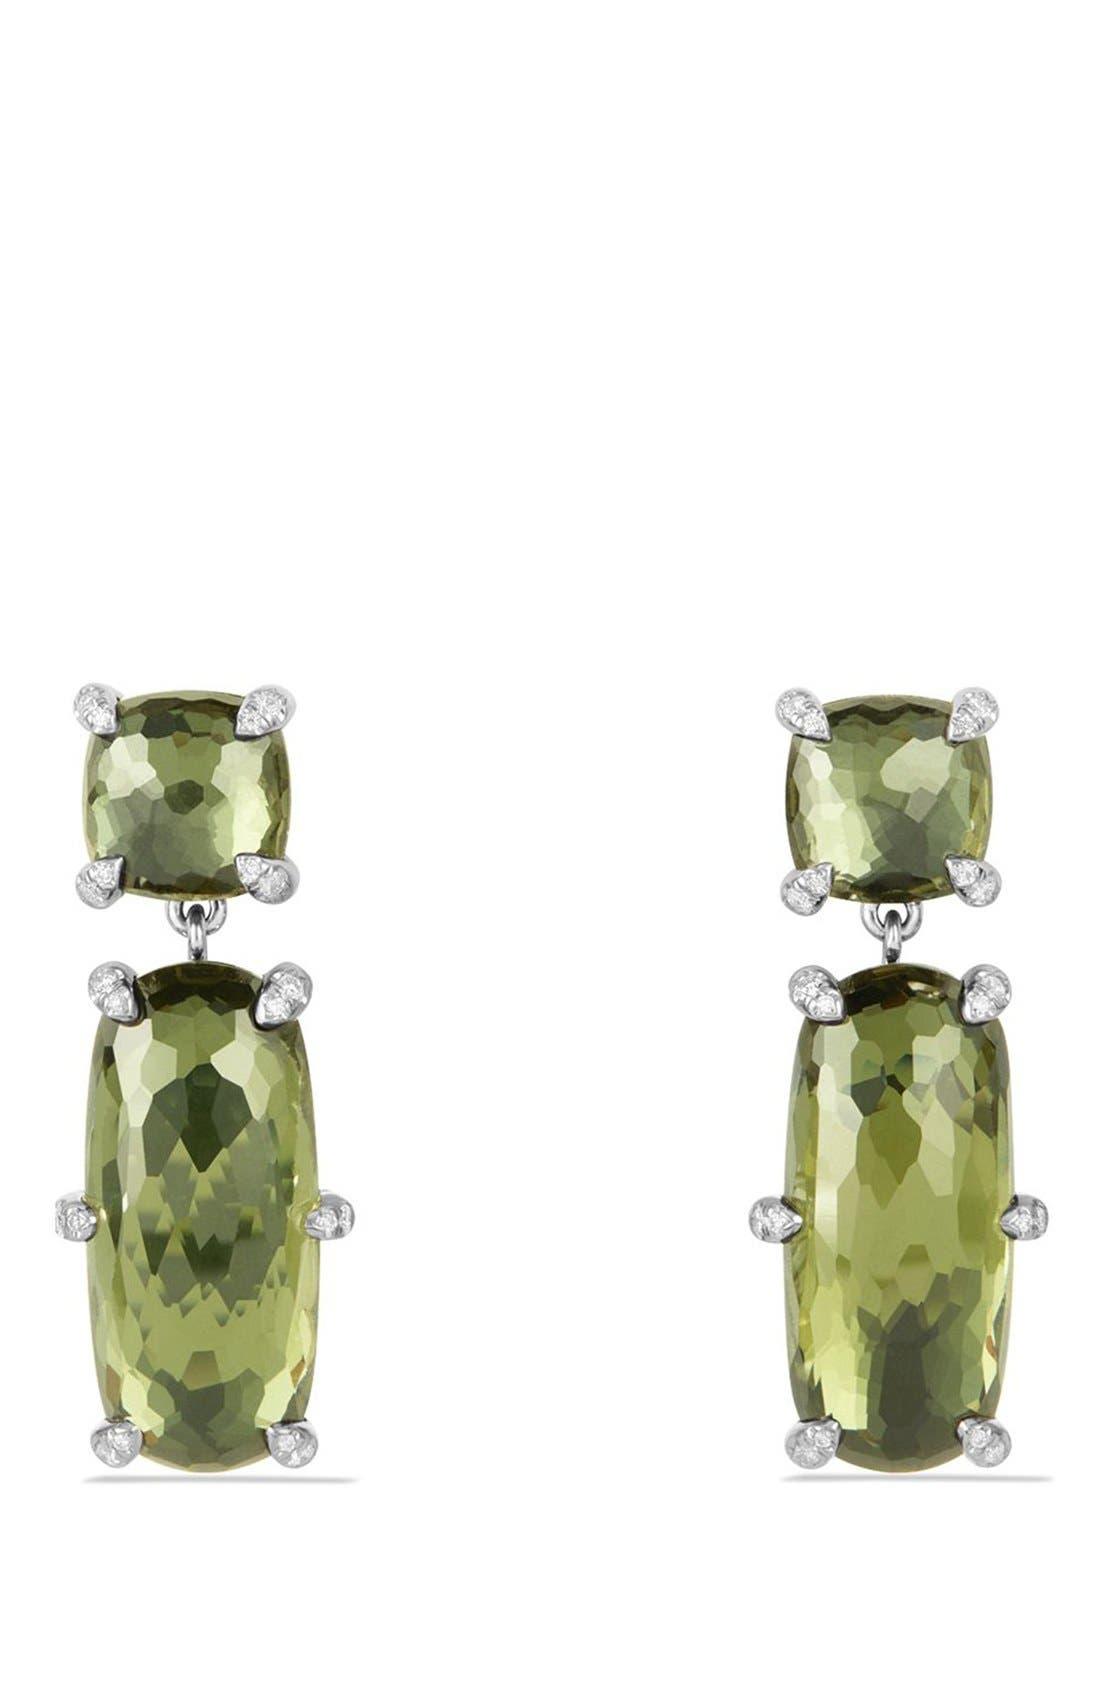 Main Image - David Yurman 'Châtelaine' Double Drop Earrings